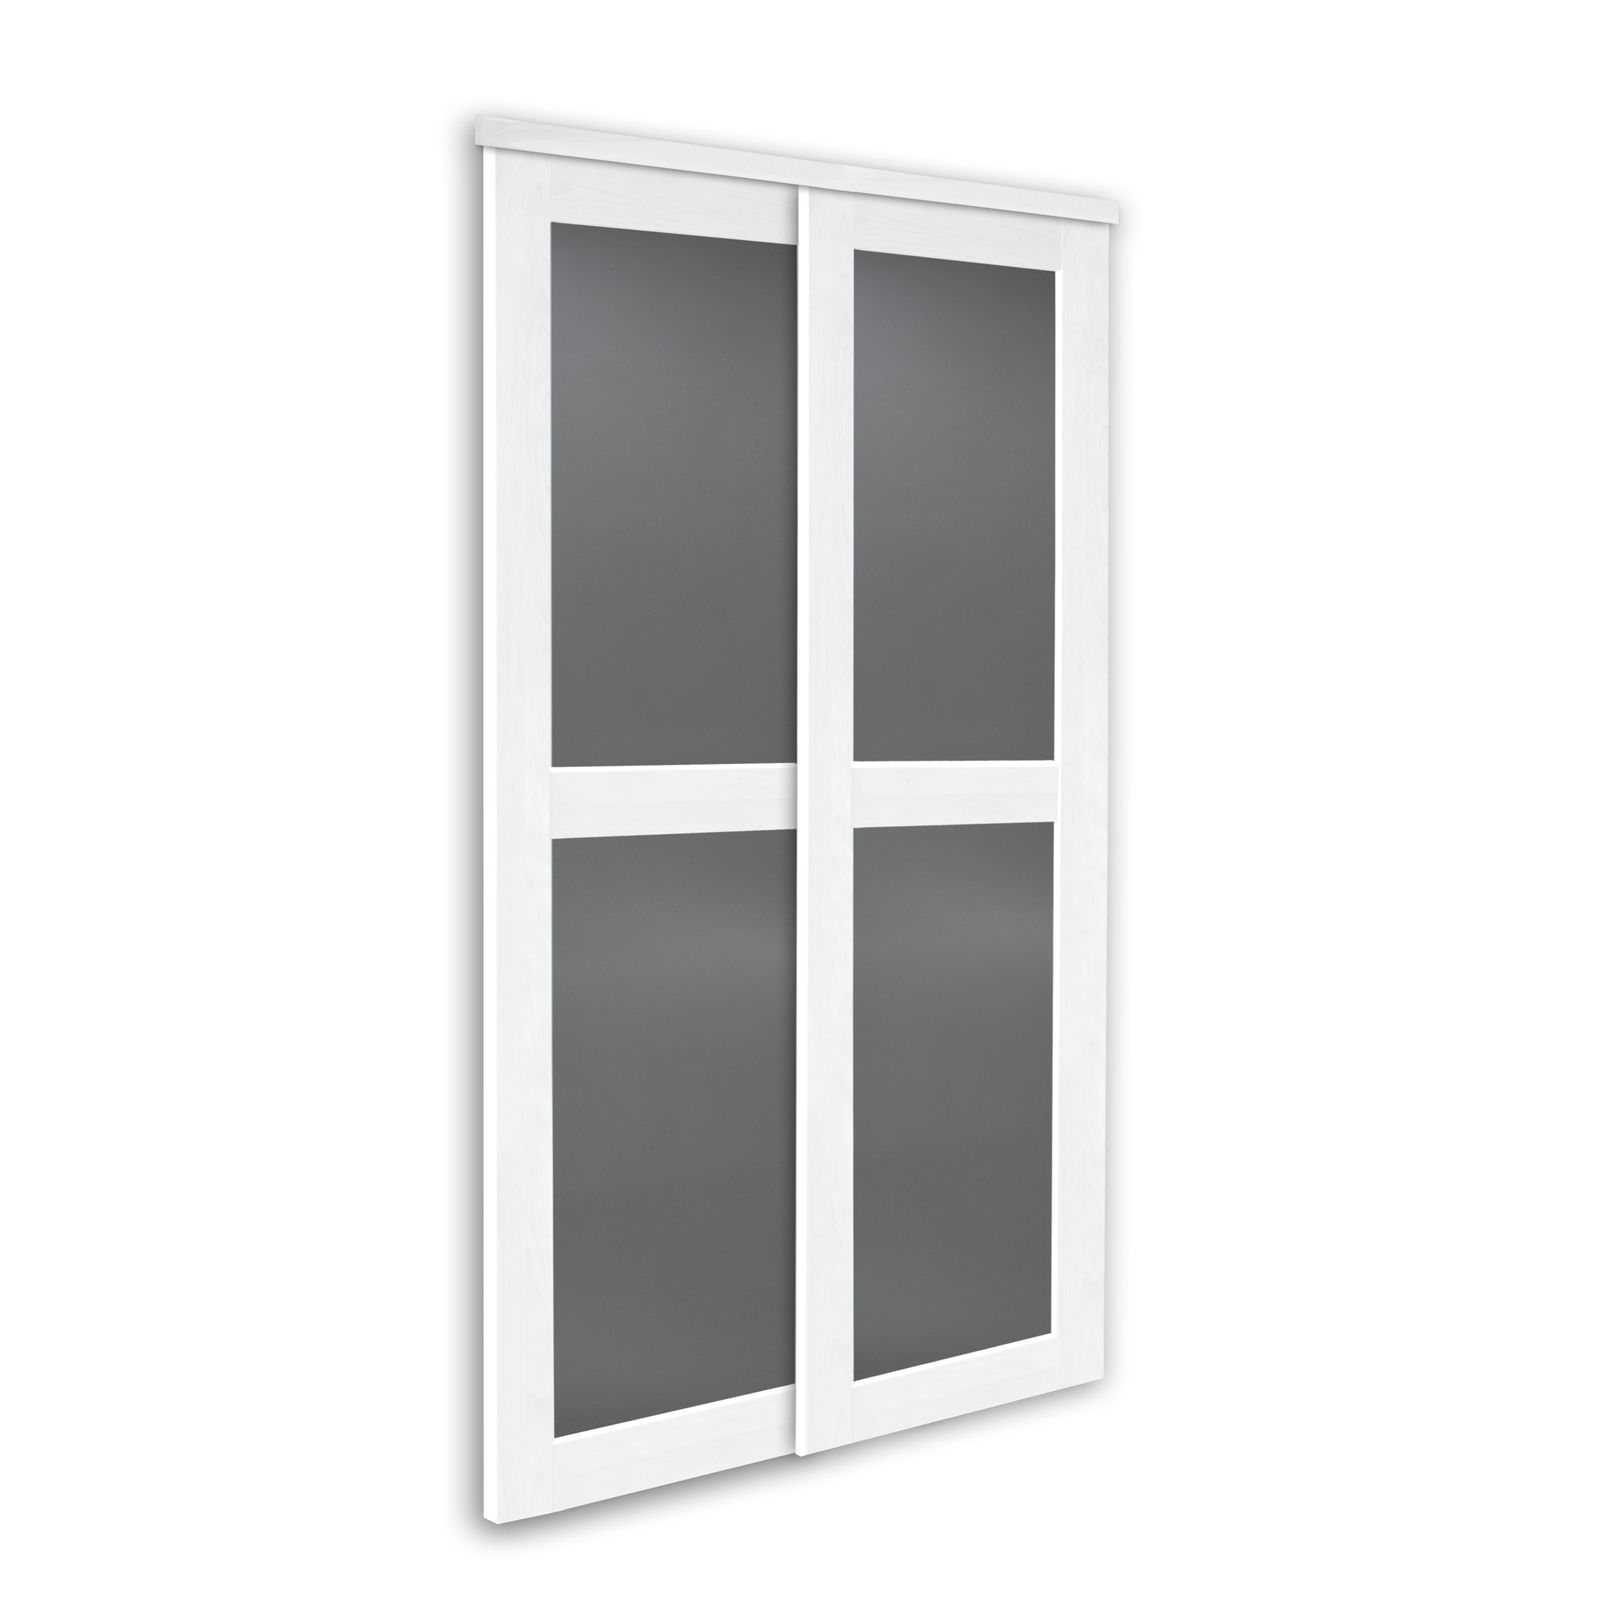 Poesie grey lacobel with white laminated wood